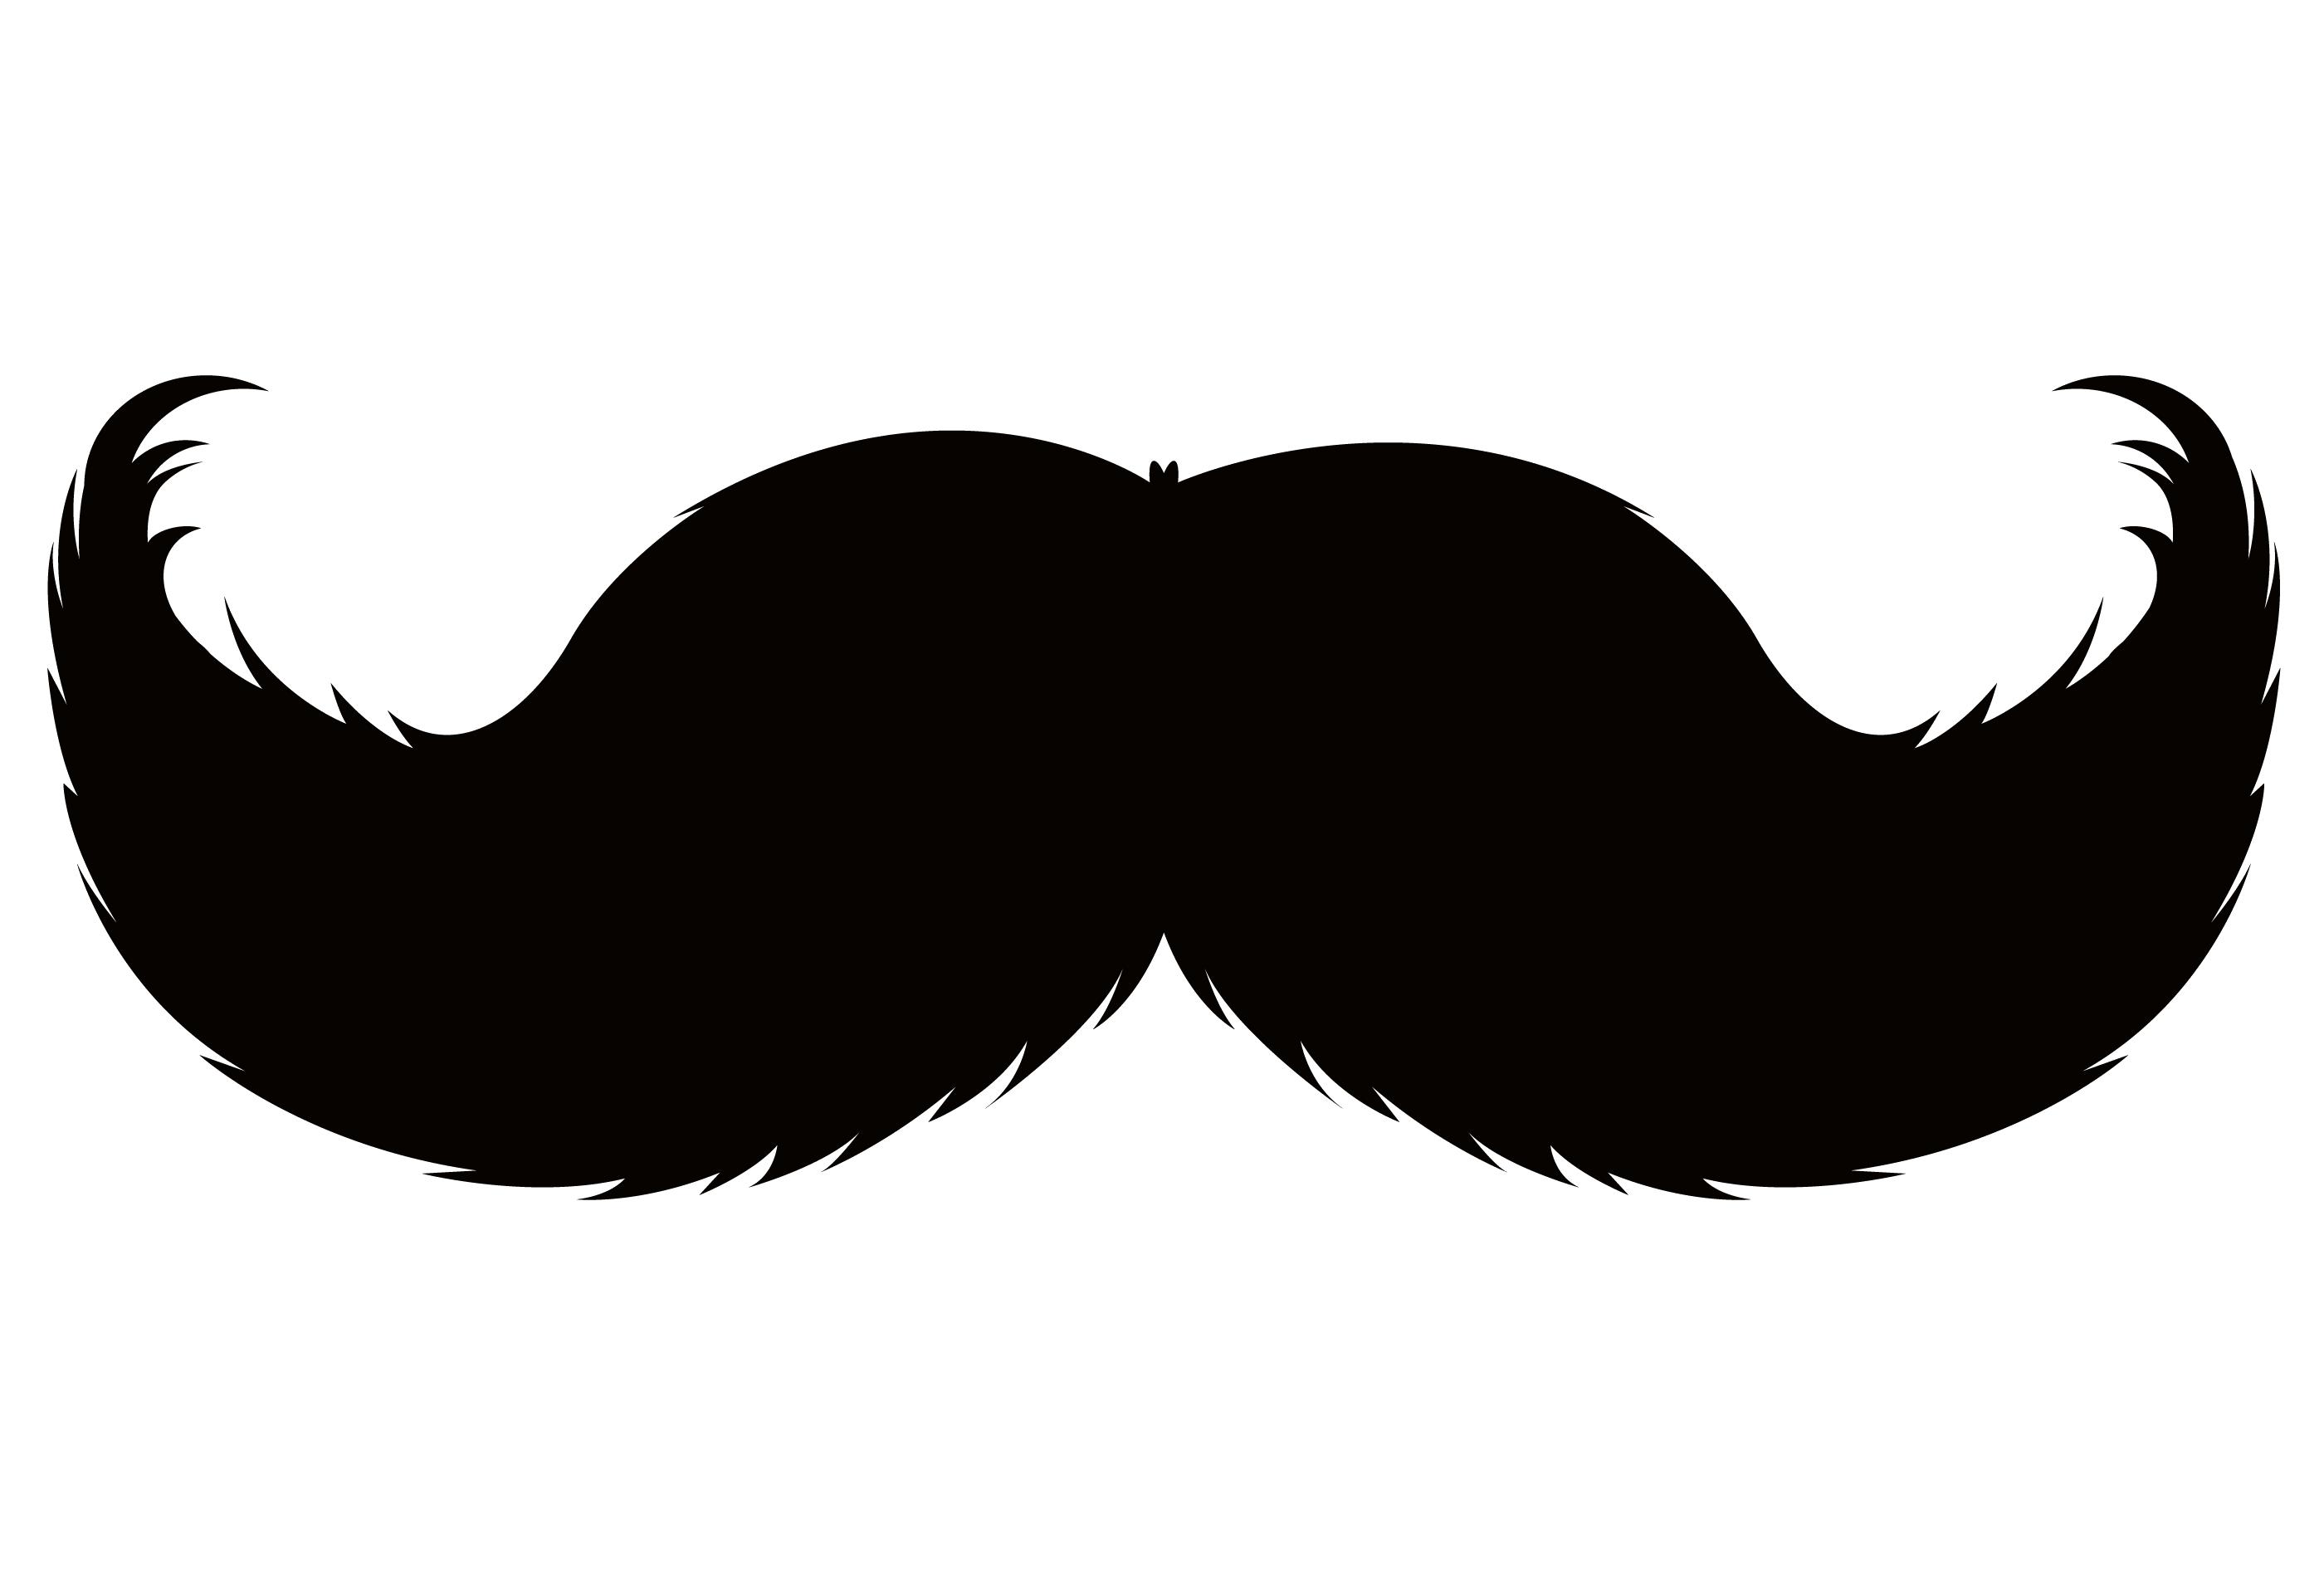 Mustache clipart handlebar mustache. Moustache pencil beard clip